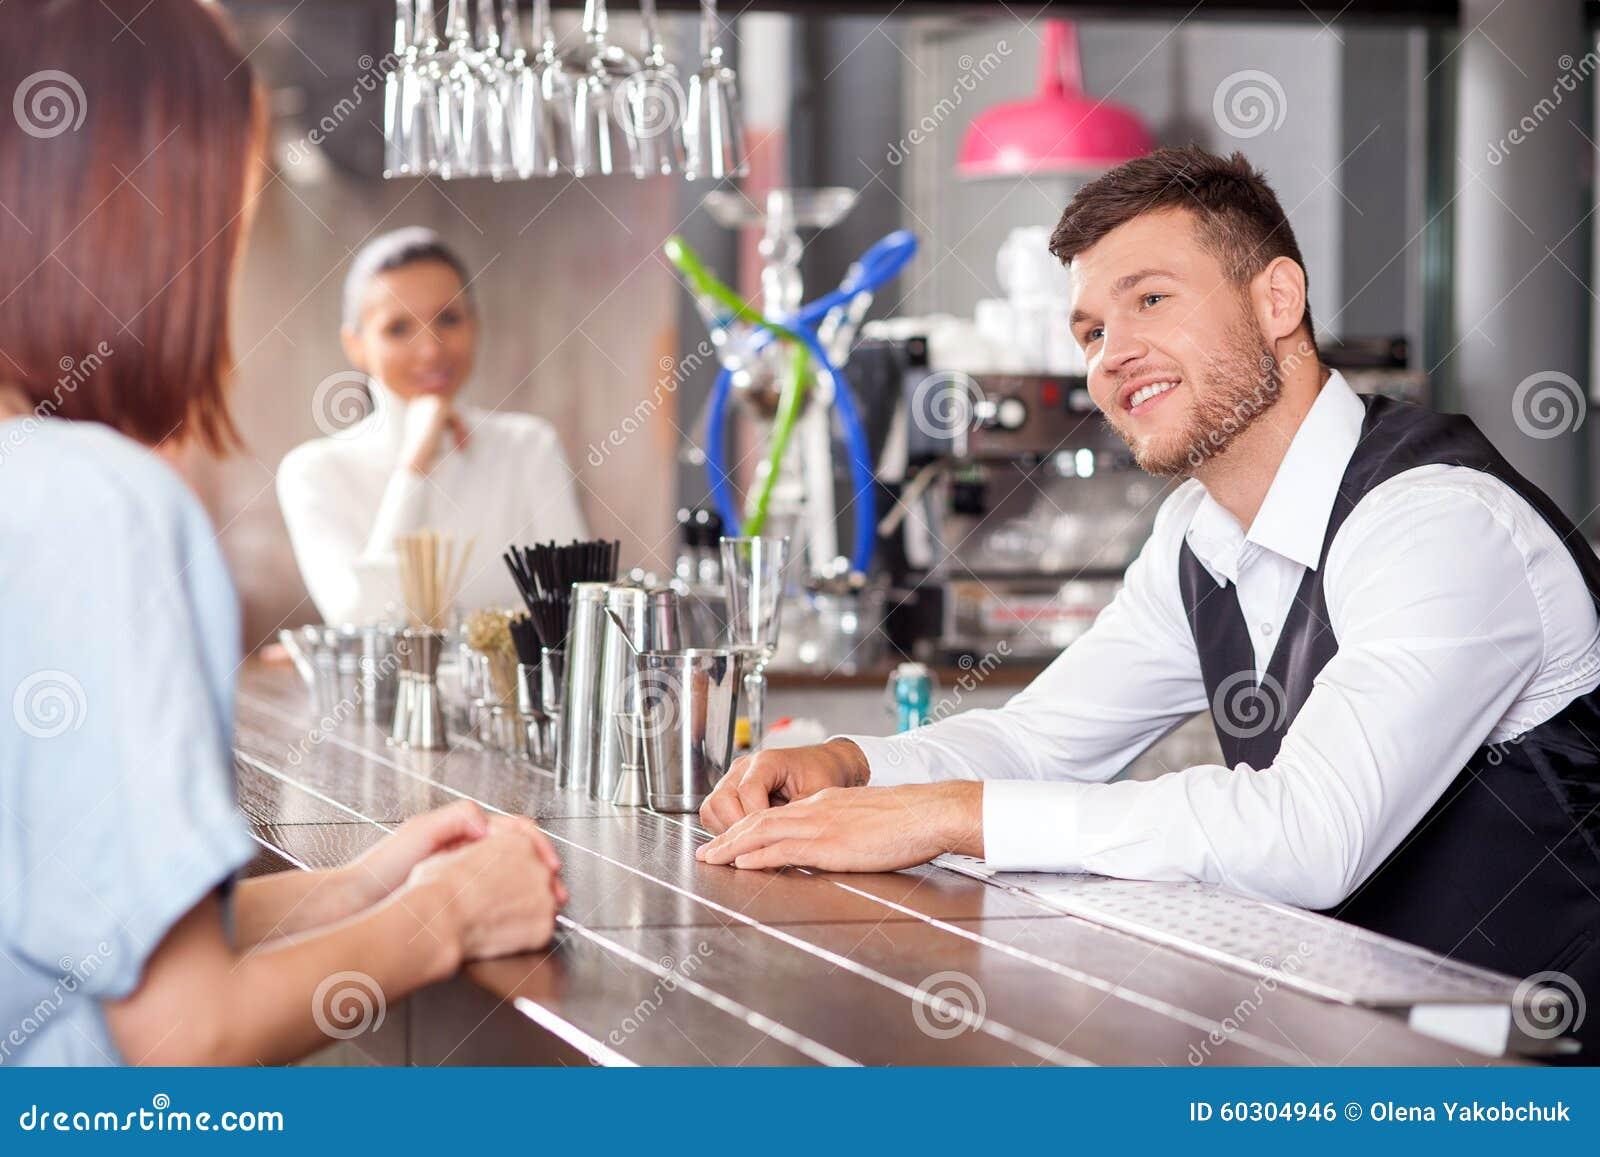 http://thumbs.dreamstime.com/z/woman-flirting-repairman-46285162.jpg_快乐的侍酒者站立在柜台并且与妇女谈话 他看夫人flirtingly和微笑